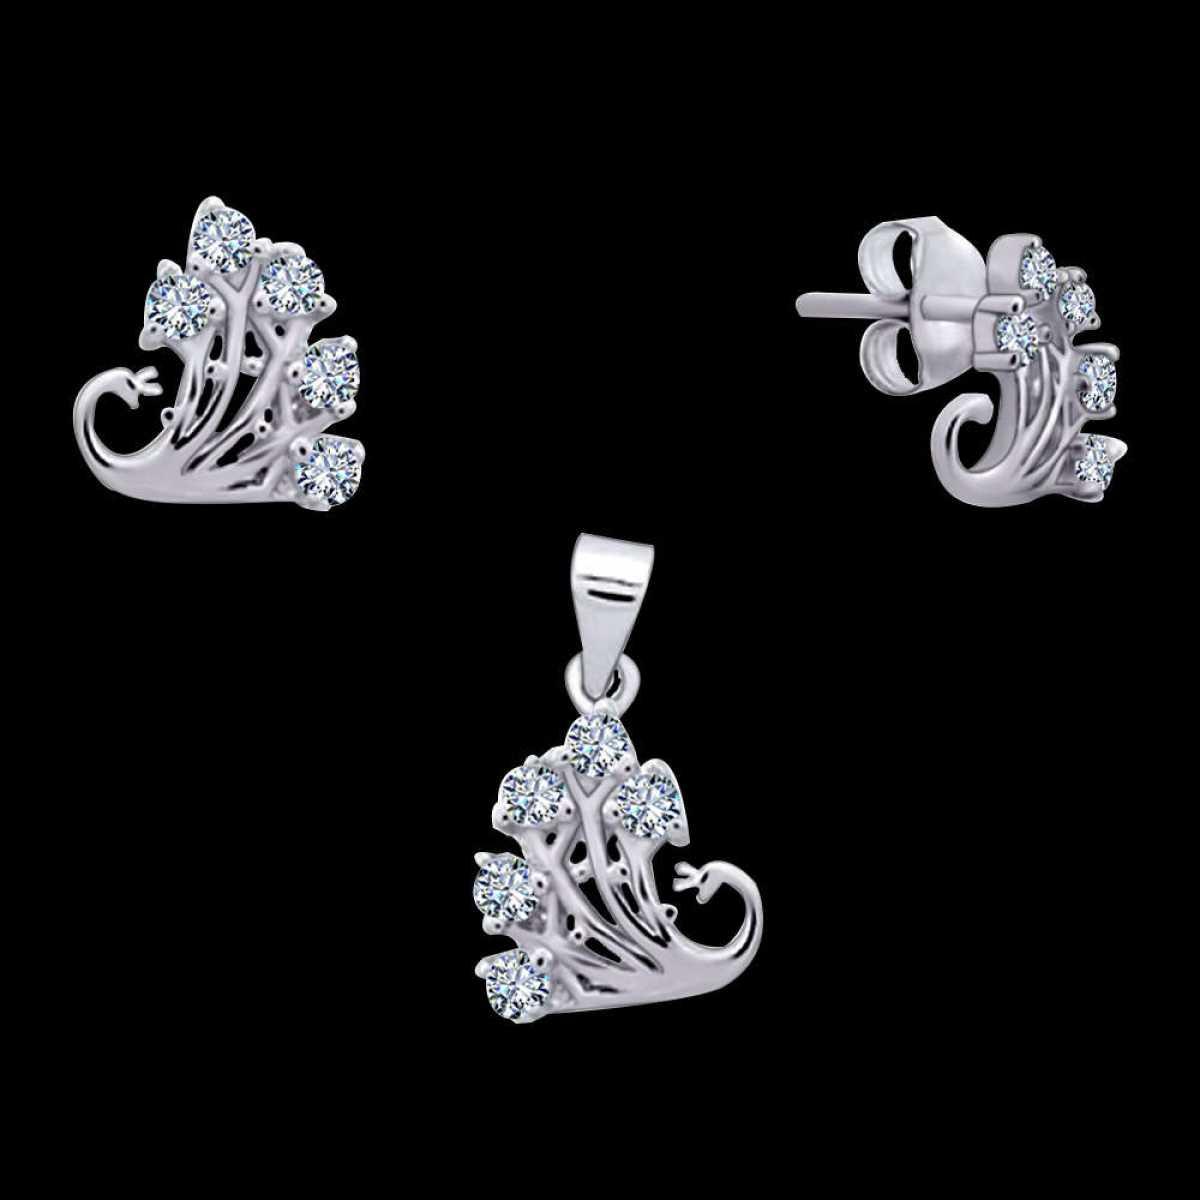 Combination Five Diamond Pendant Set